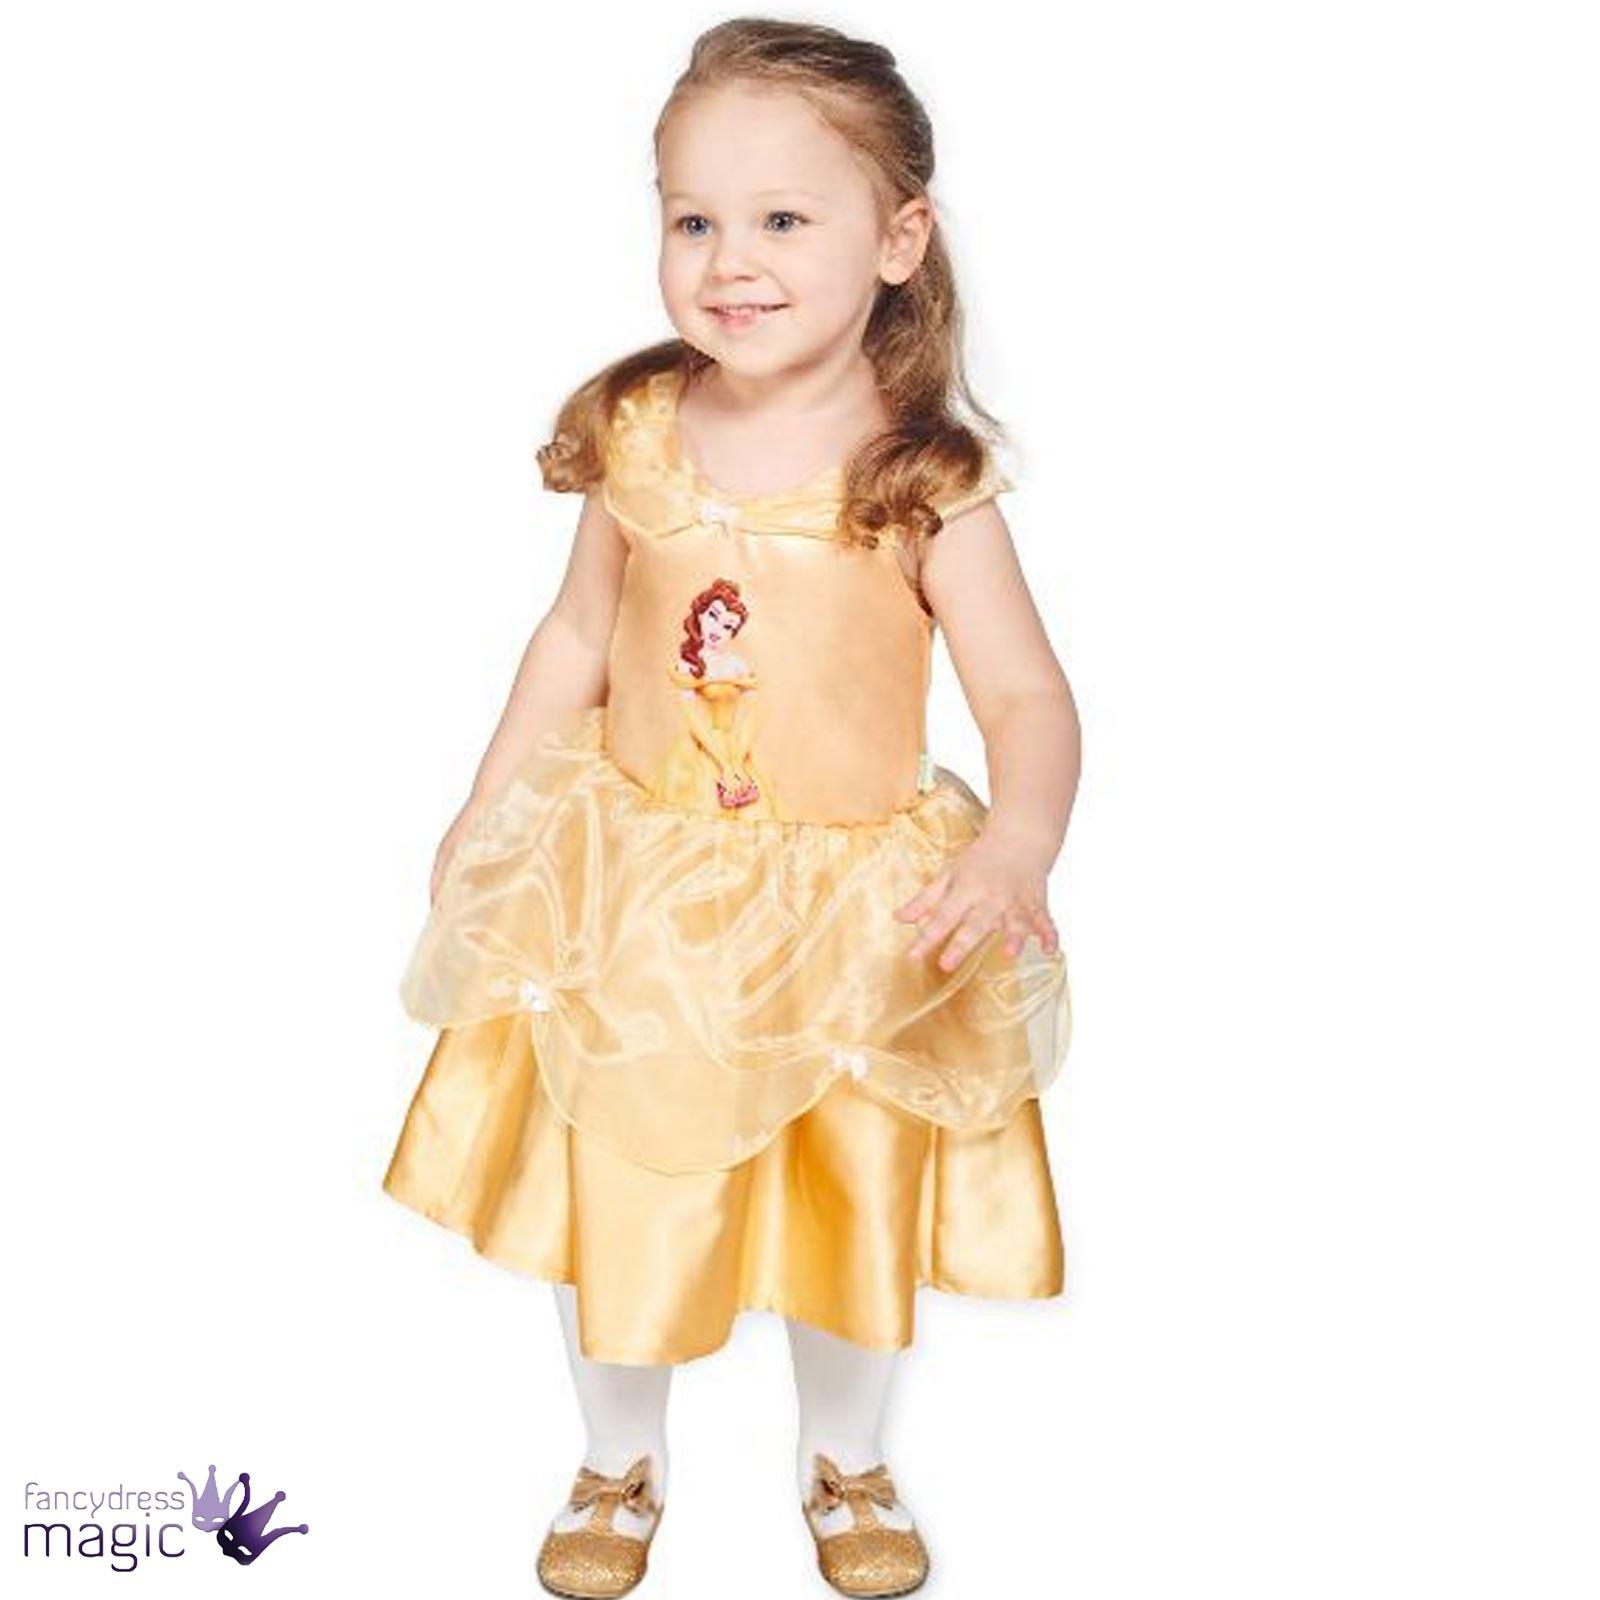 Baby toddler disney princess fairy tale dress up fancy dress costume